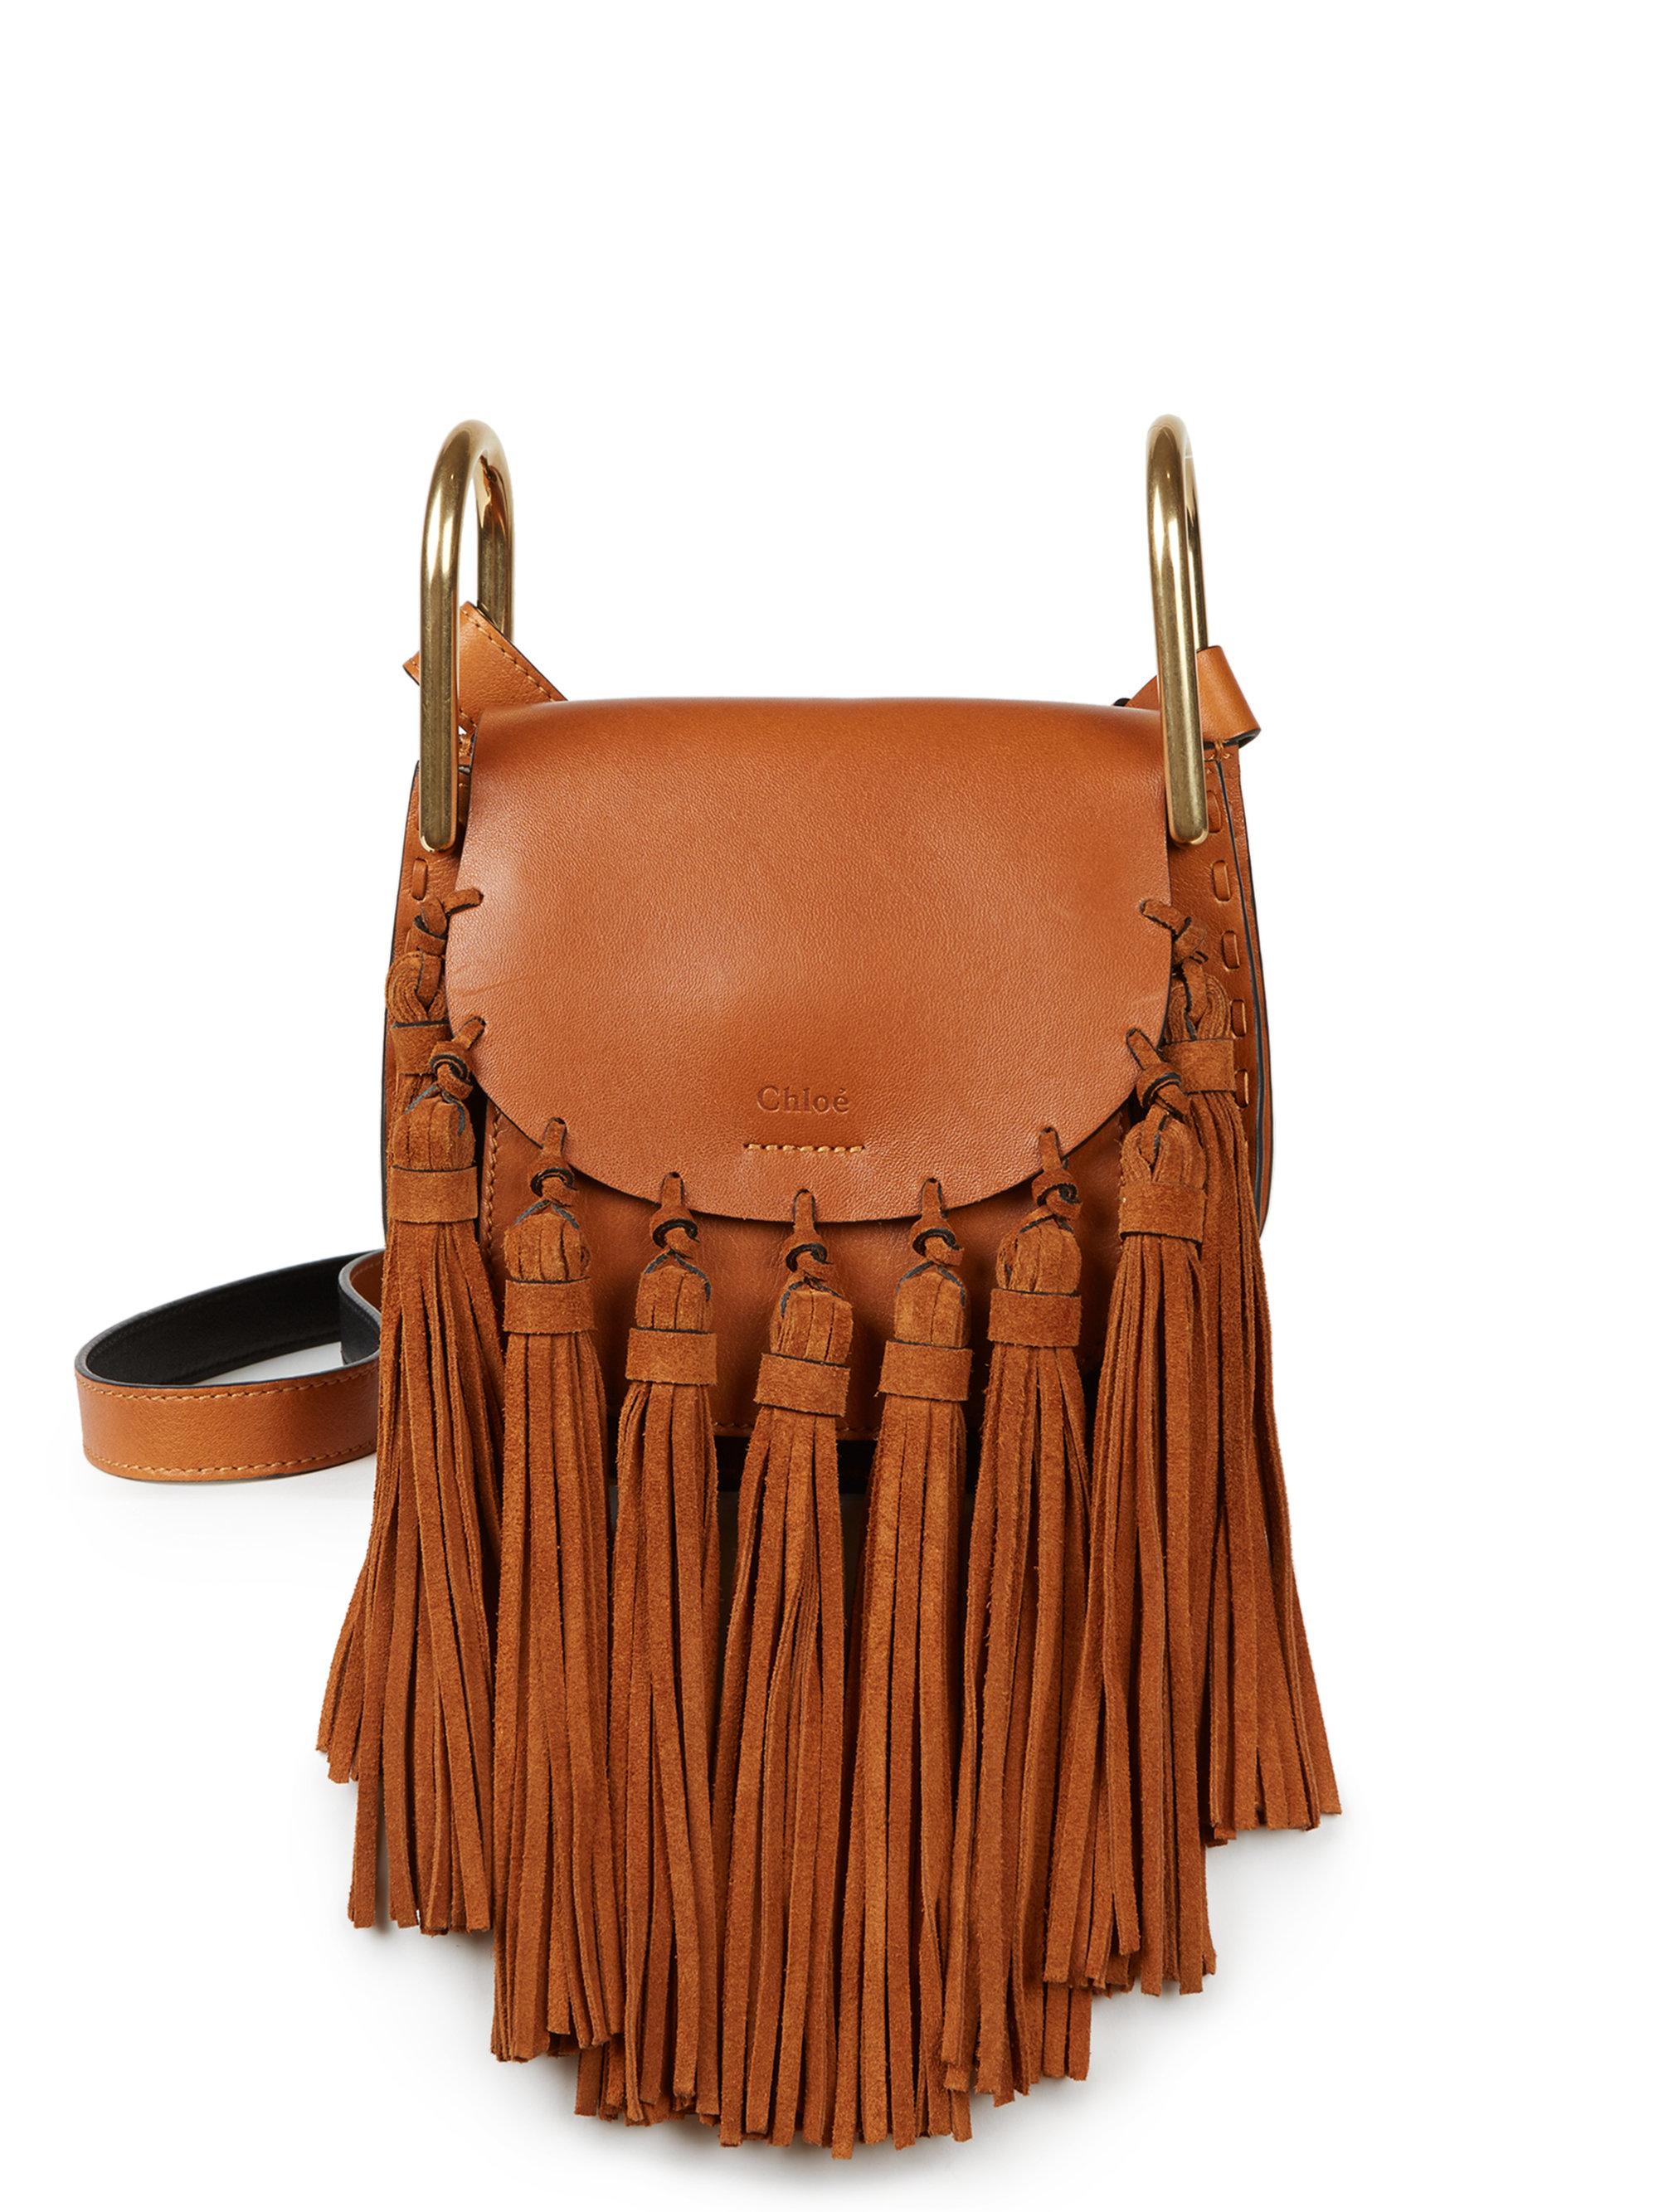 e27ec6863782d Chloé Hudson Small Leather & Suede Tassel Shoulder Bag in Brown - Lyst